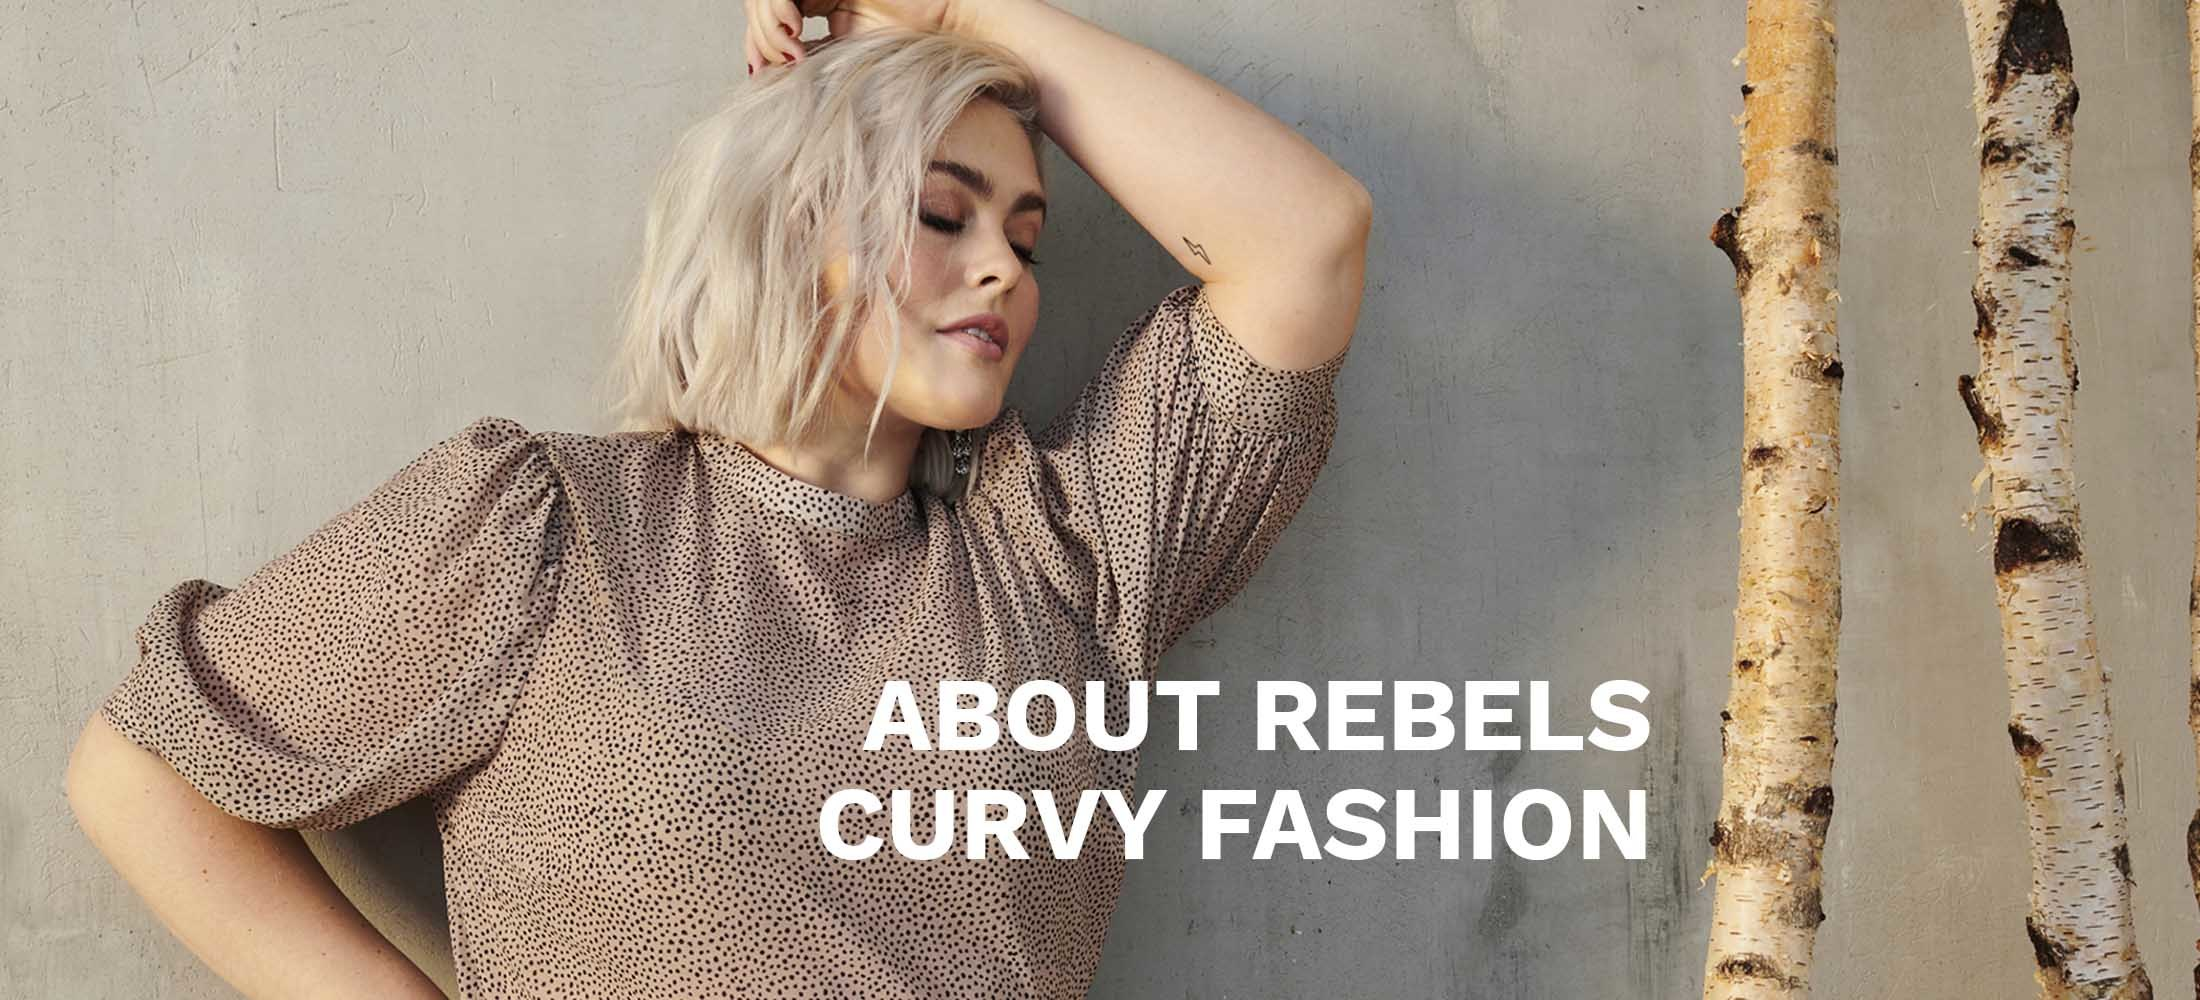 About Rebels Curvy Fashion